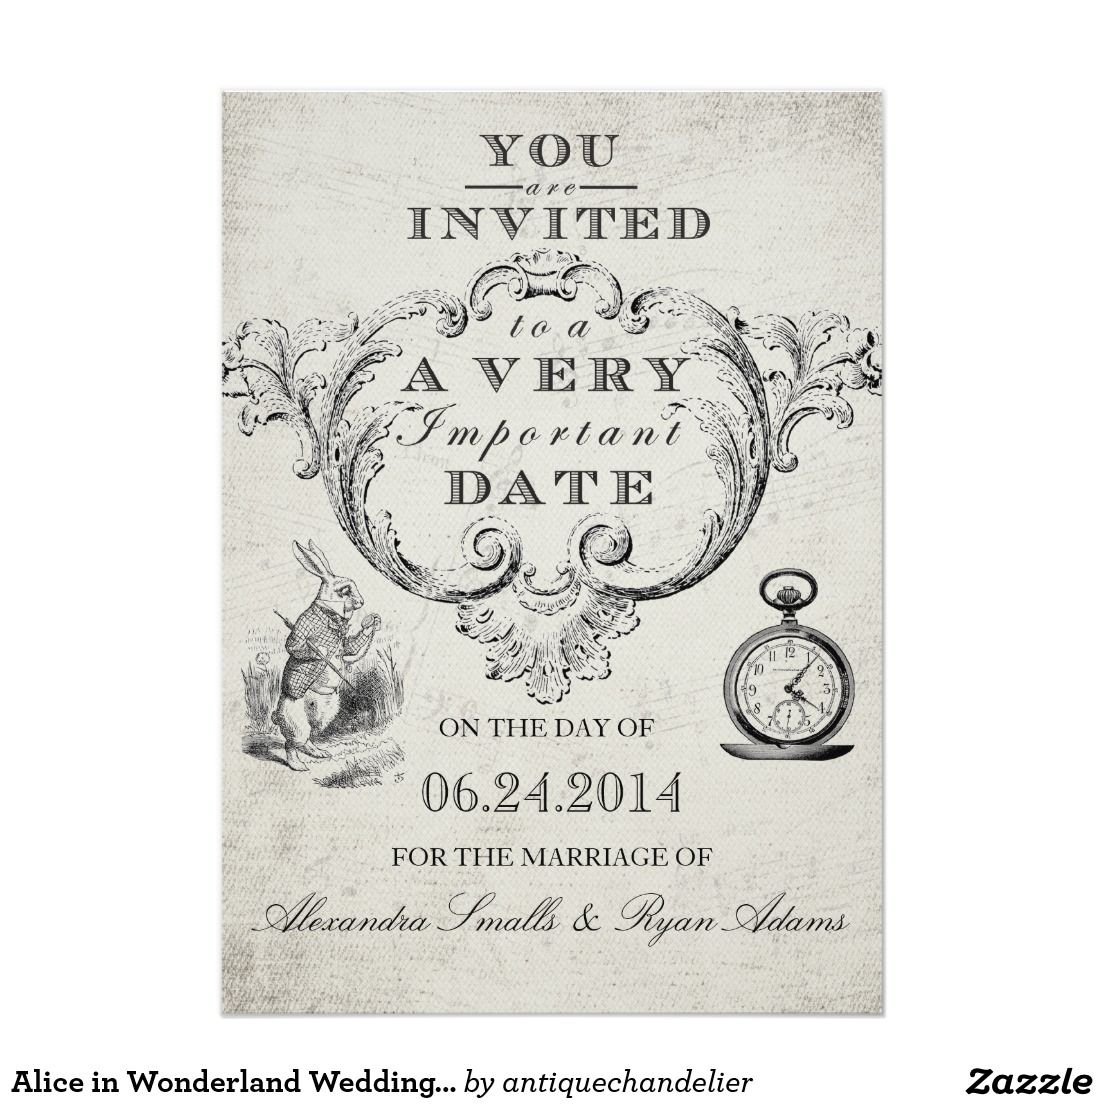 Alice in Wonderland Wedding Invitation | Art | Pinterest | Alice